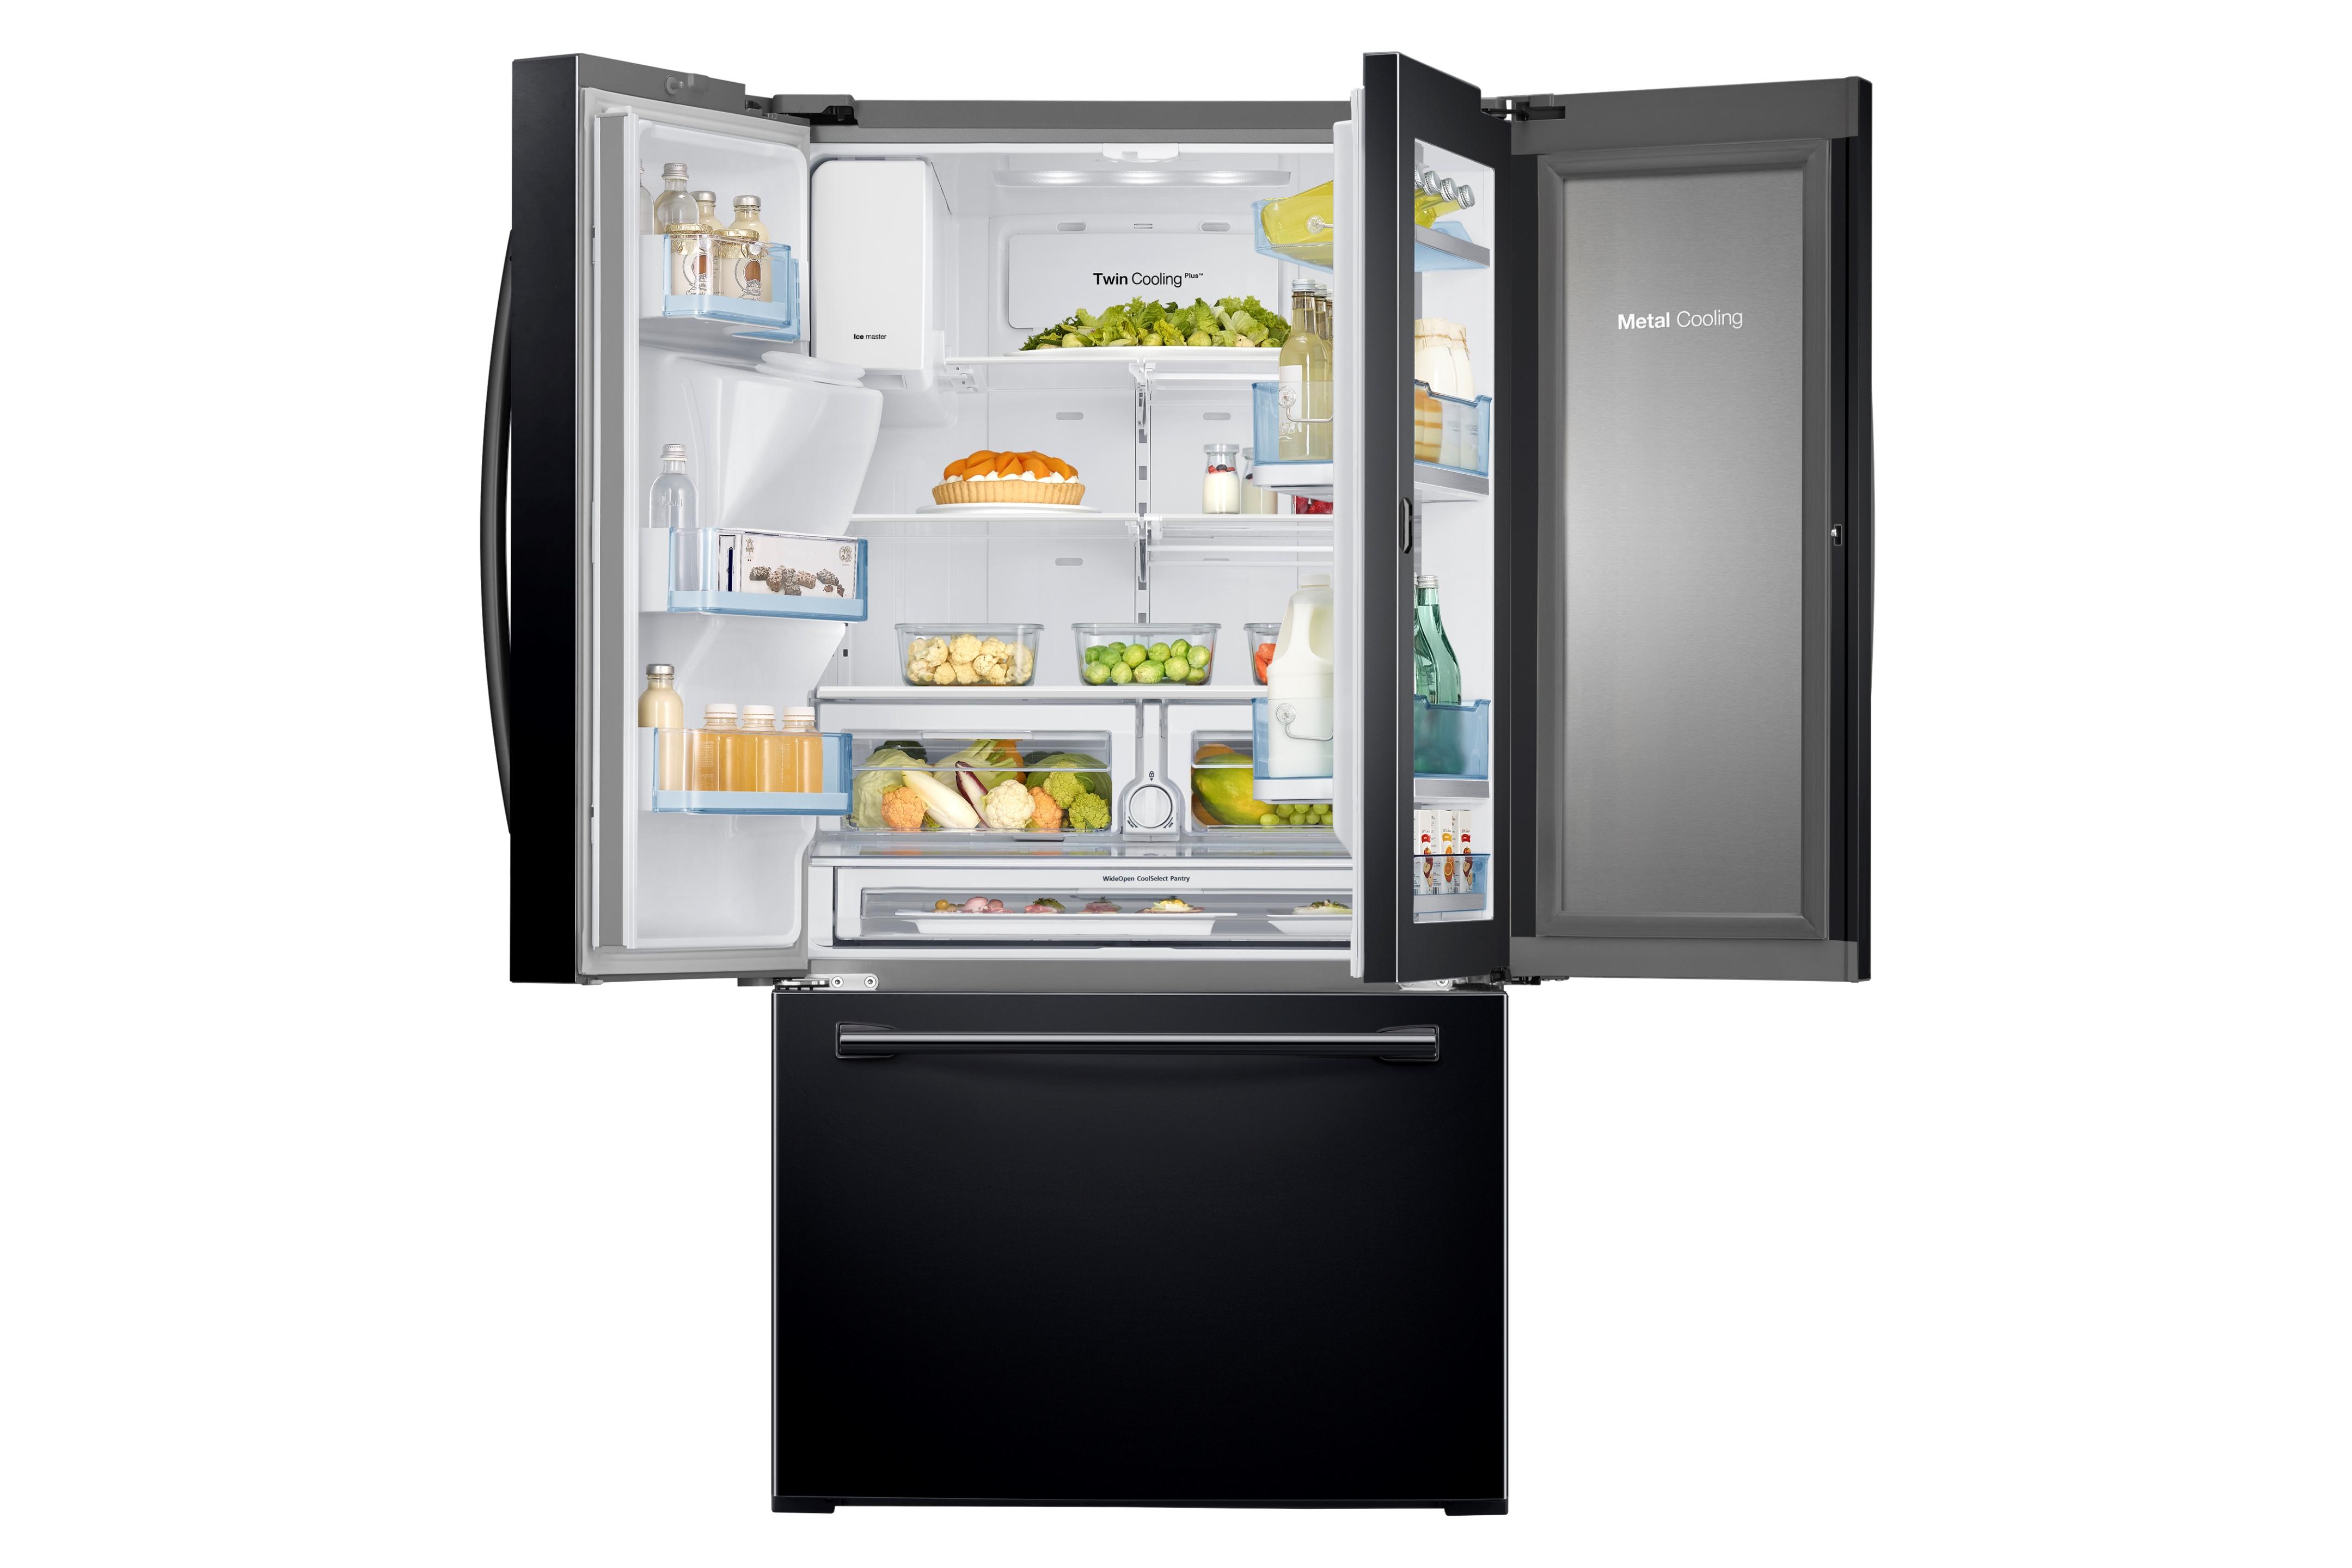 Samsung RF28HDEDPBC/AA 27.8 cu. ft. Capacity 3-Door French Door Food ShowCase Refrigerator - Black